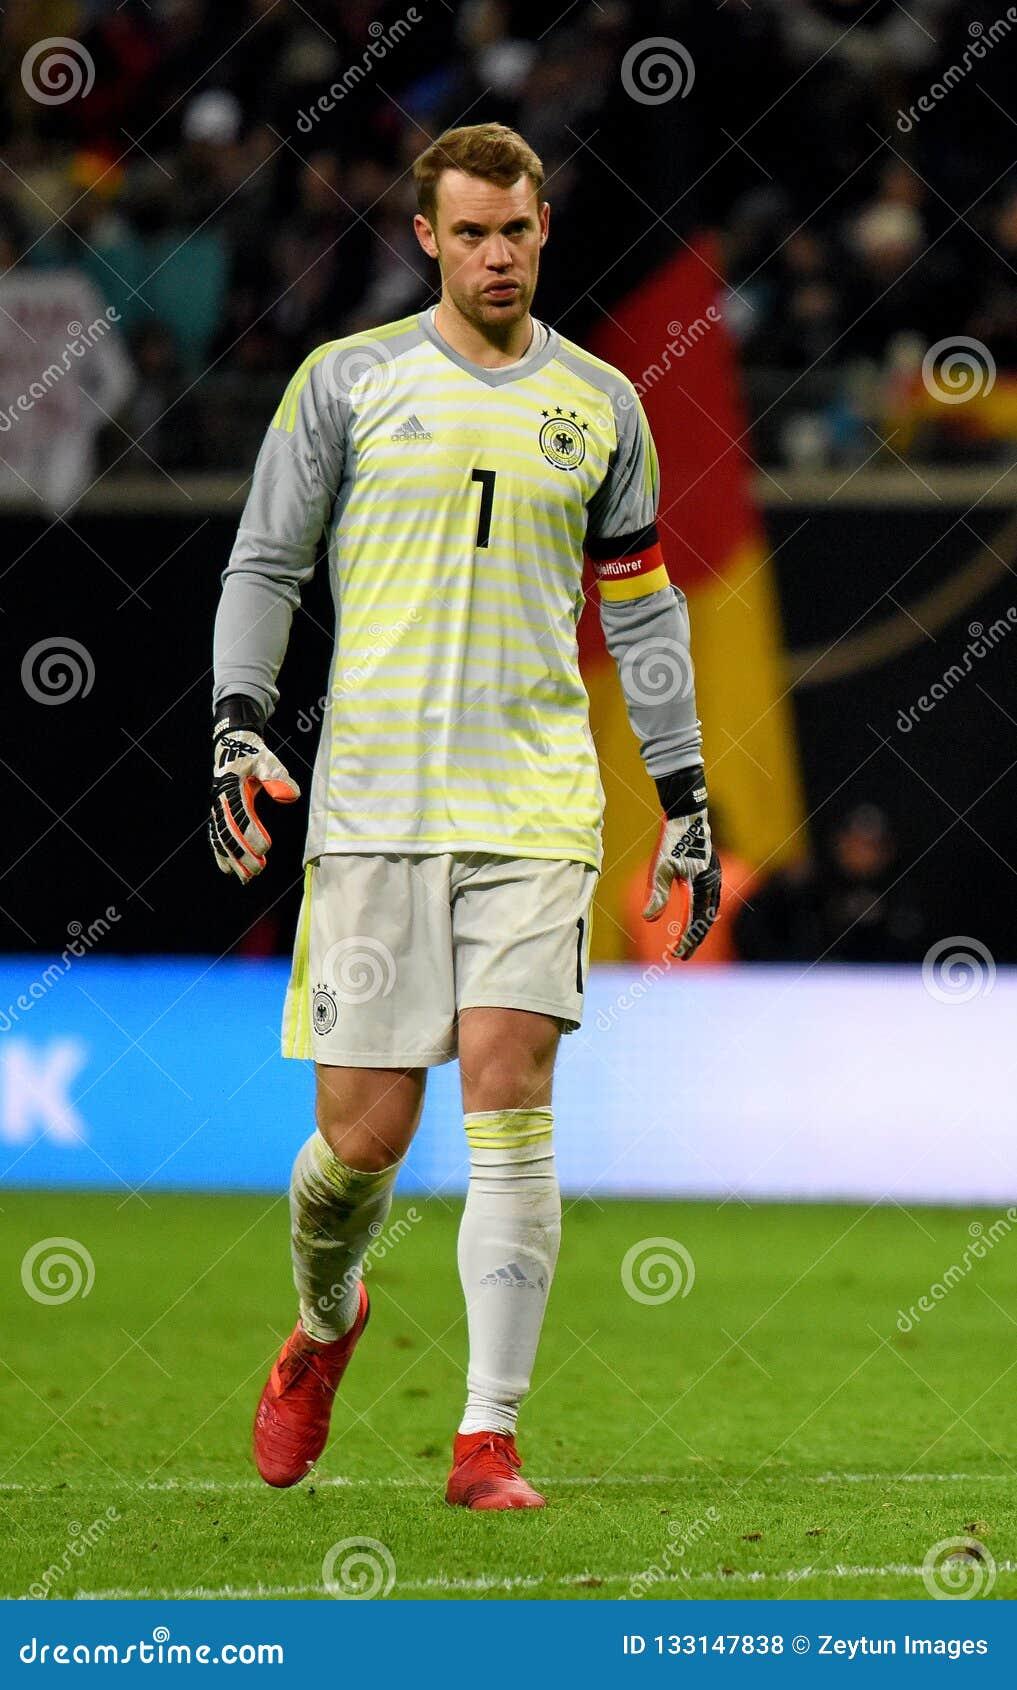 new style 67fc8 6dbd0 Bayern Munich And Germany National Team Goalkeeper Manuel ...